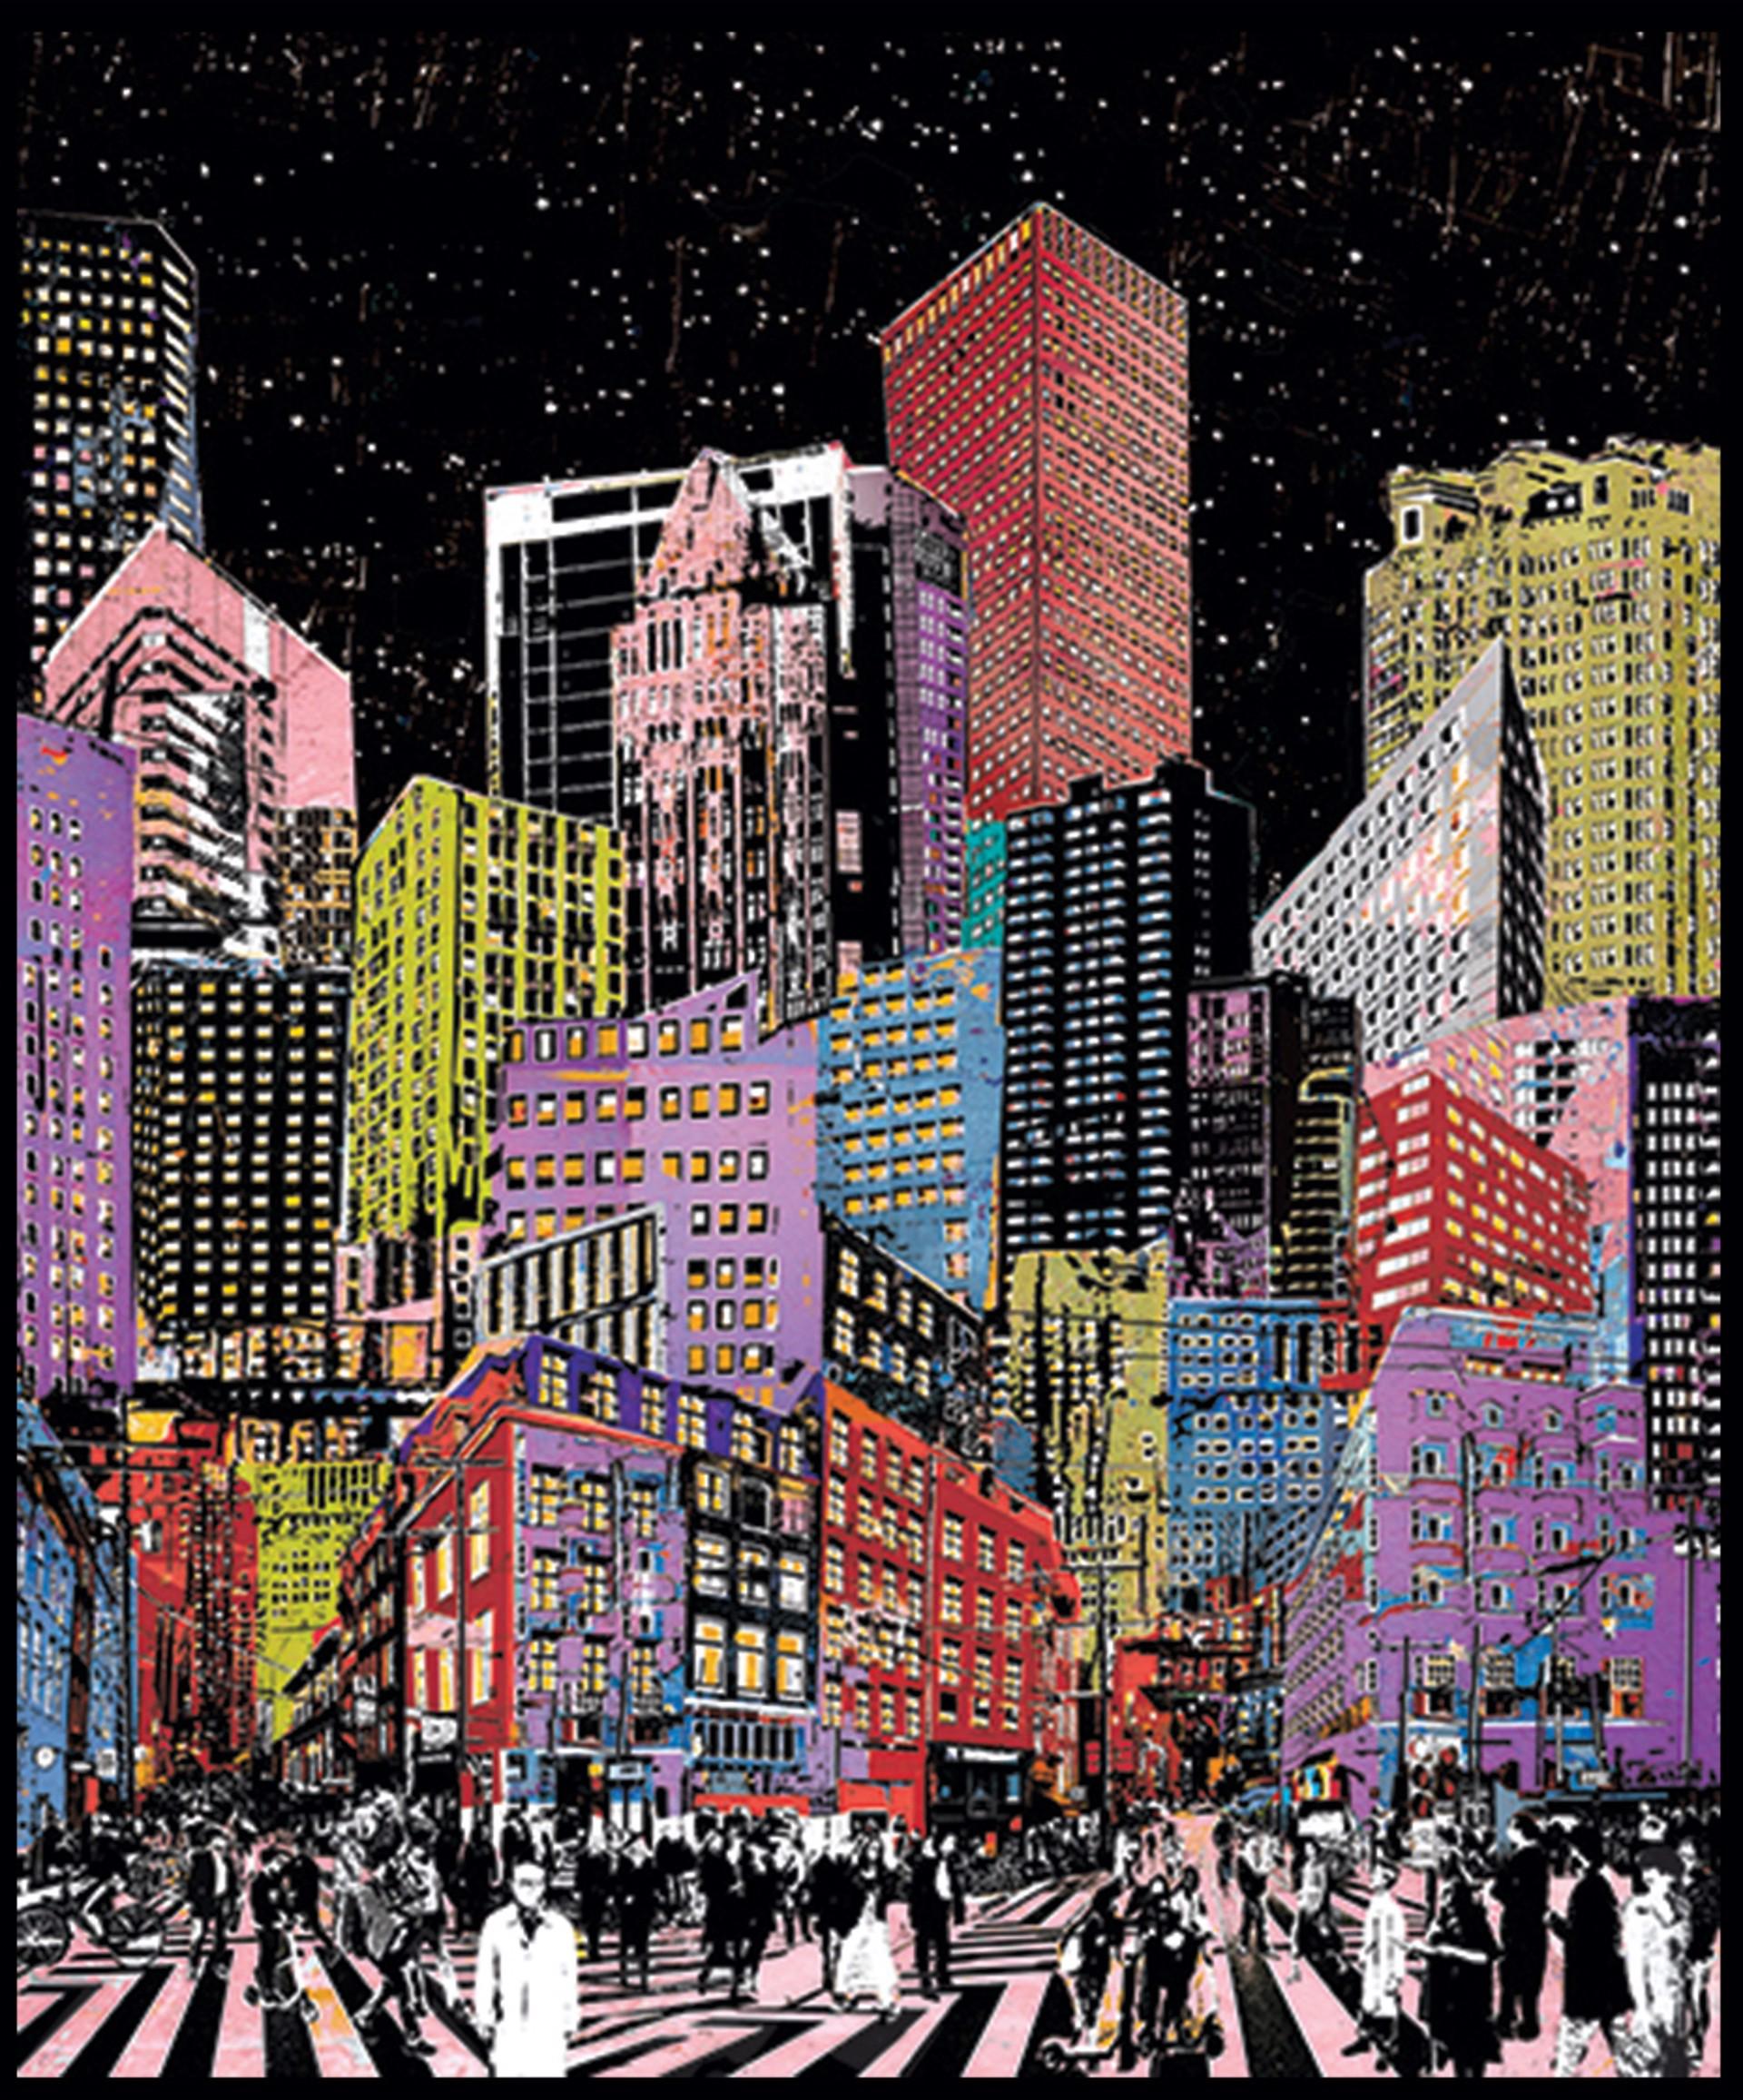 Big City at Night by Daryl Thetford